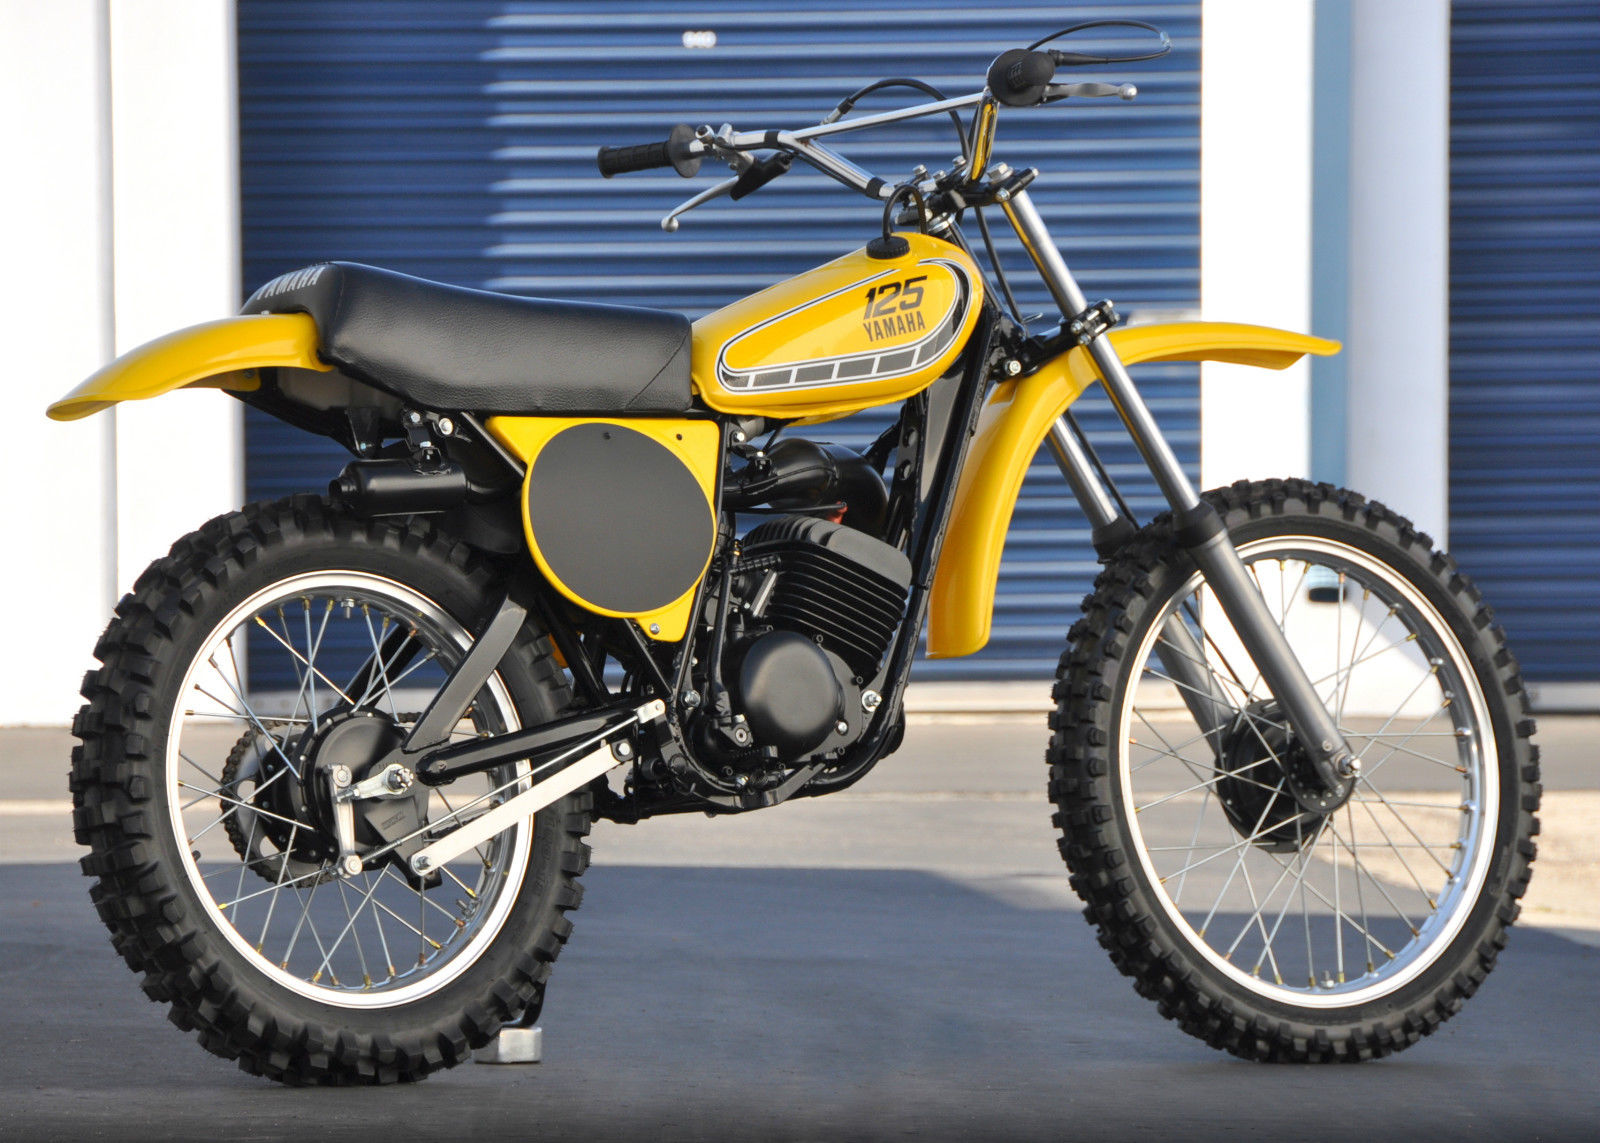 Restored Yamaha Grand